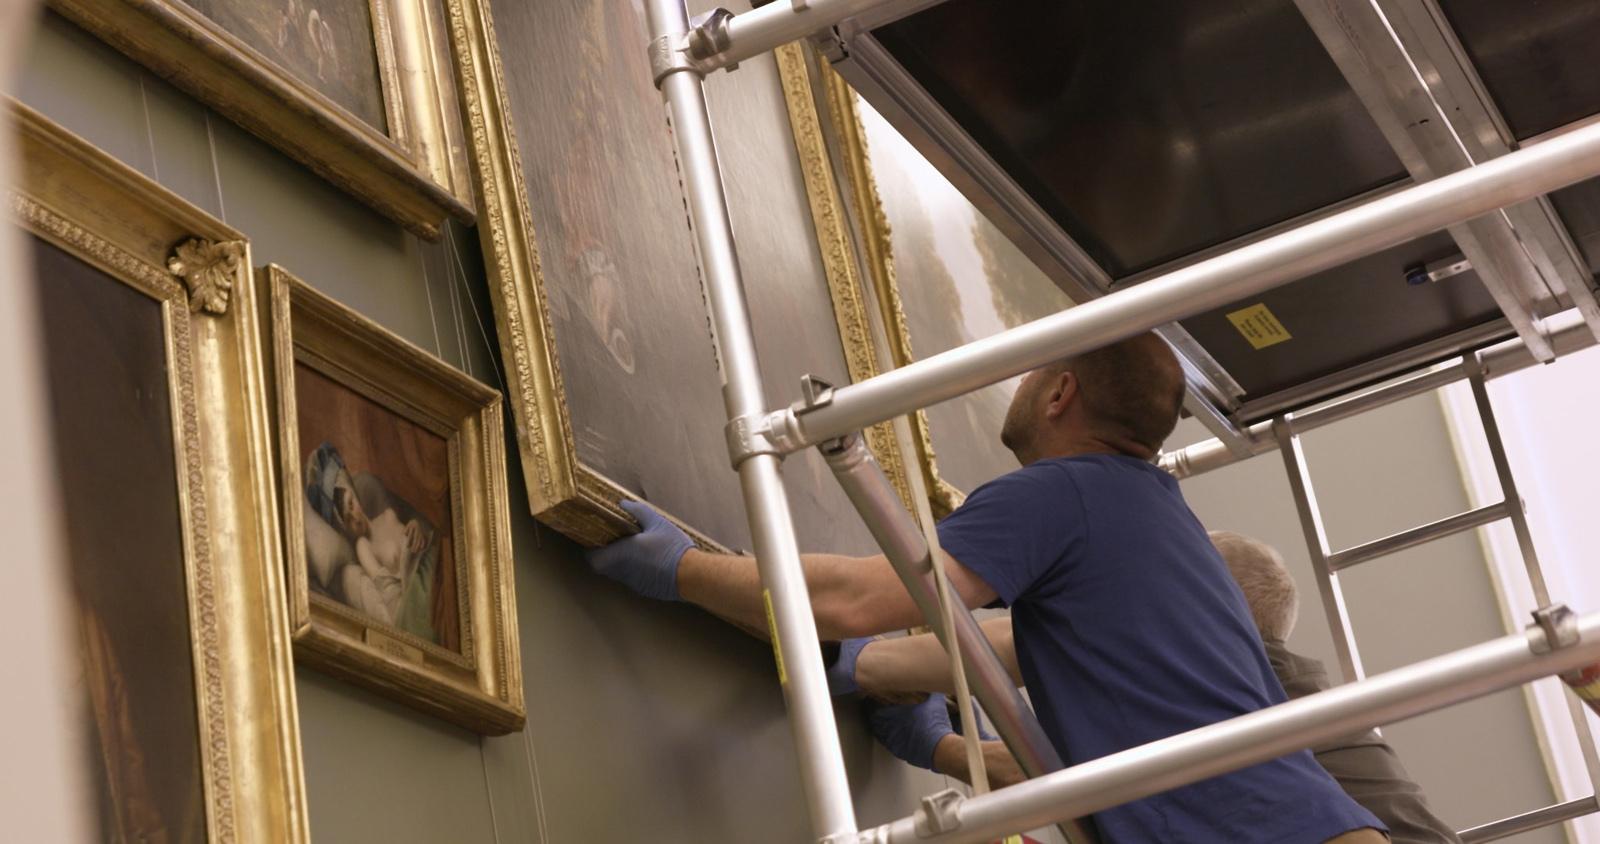 installing-the-exhibition.jpg#asset:13806